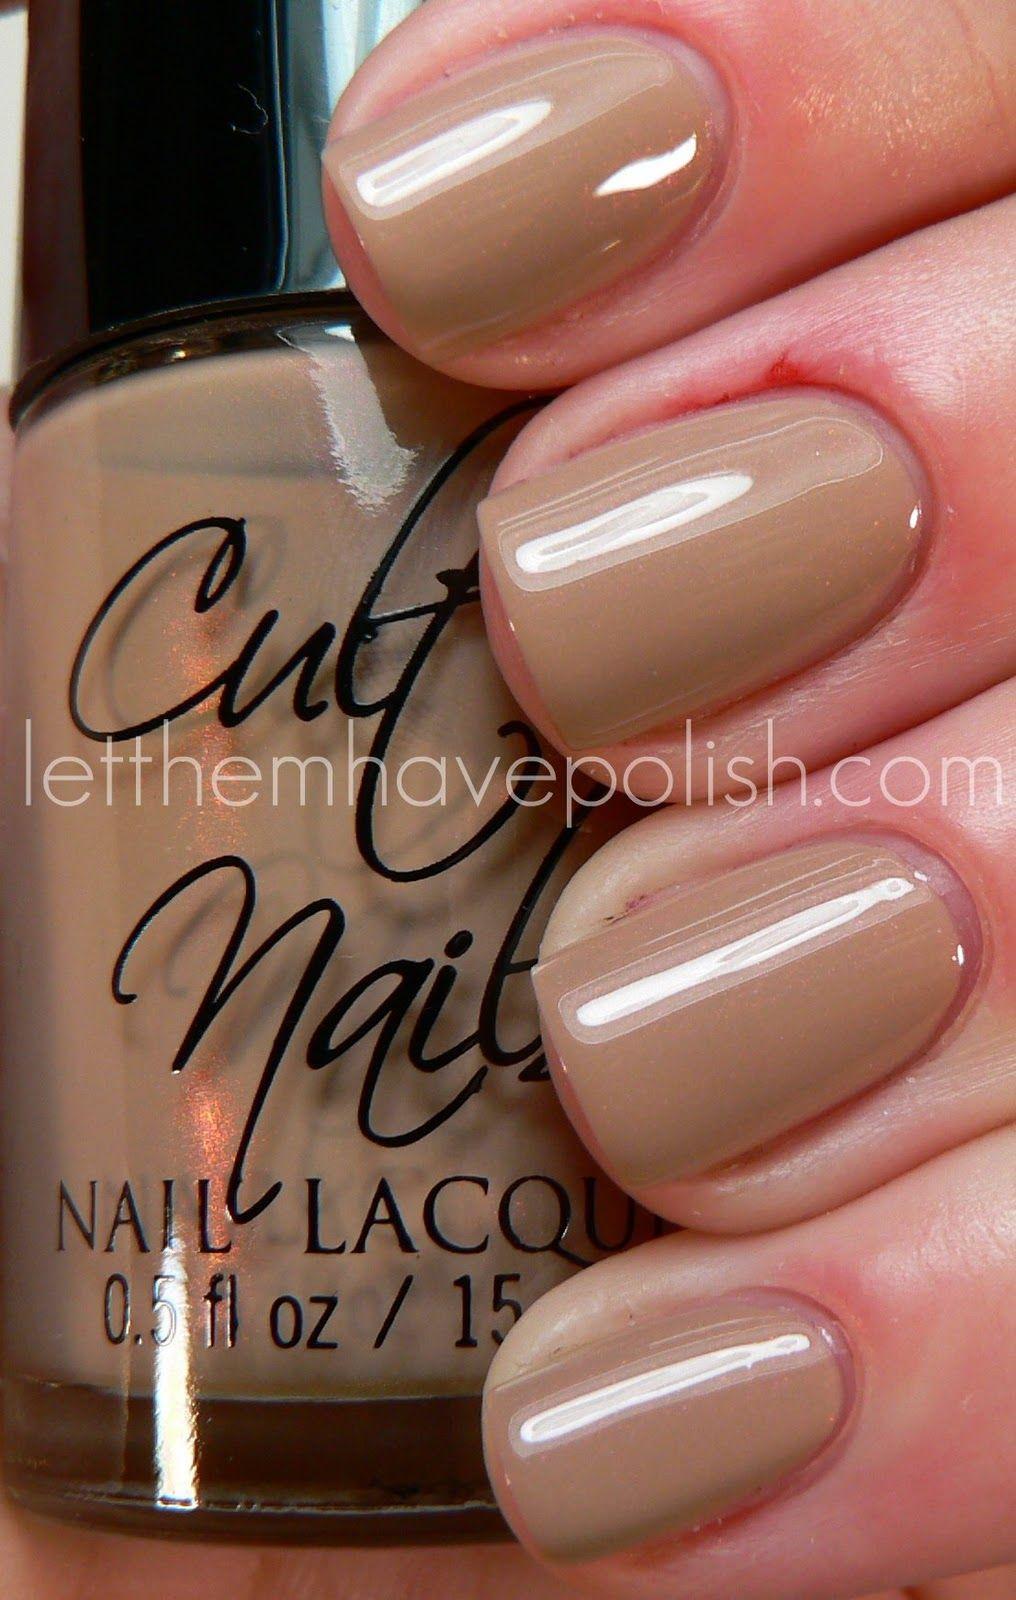 Let them have Polish!   Nails, Nail colors, Manicure